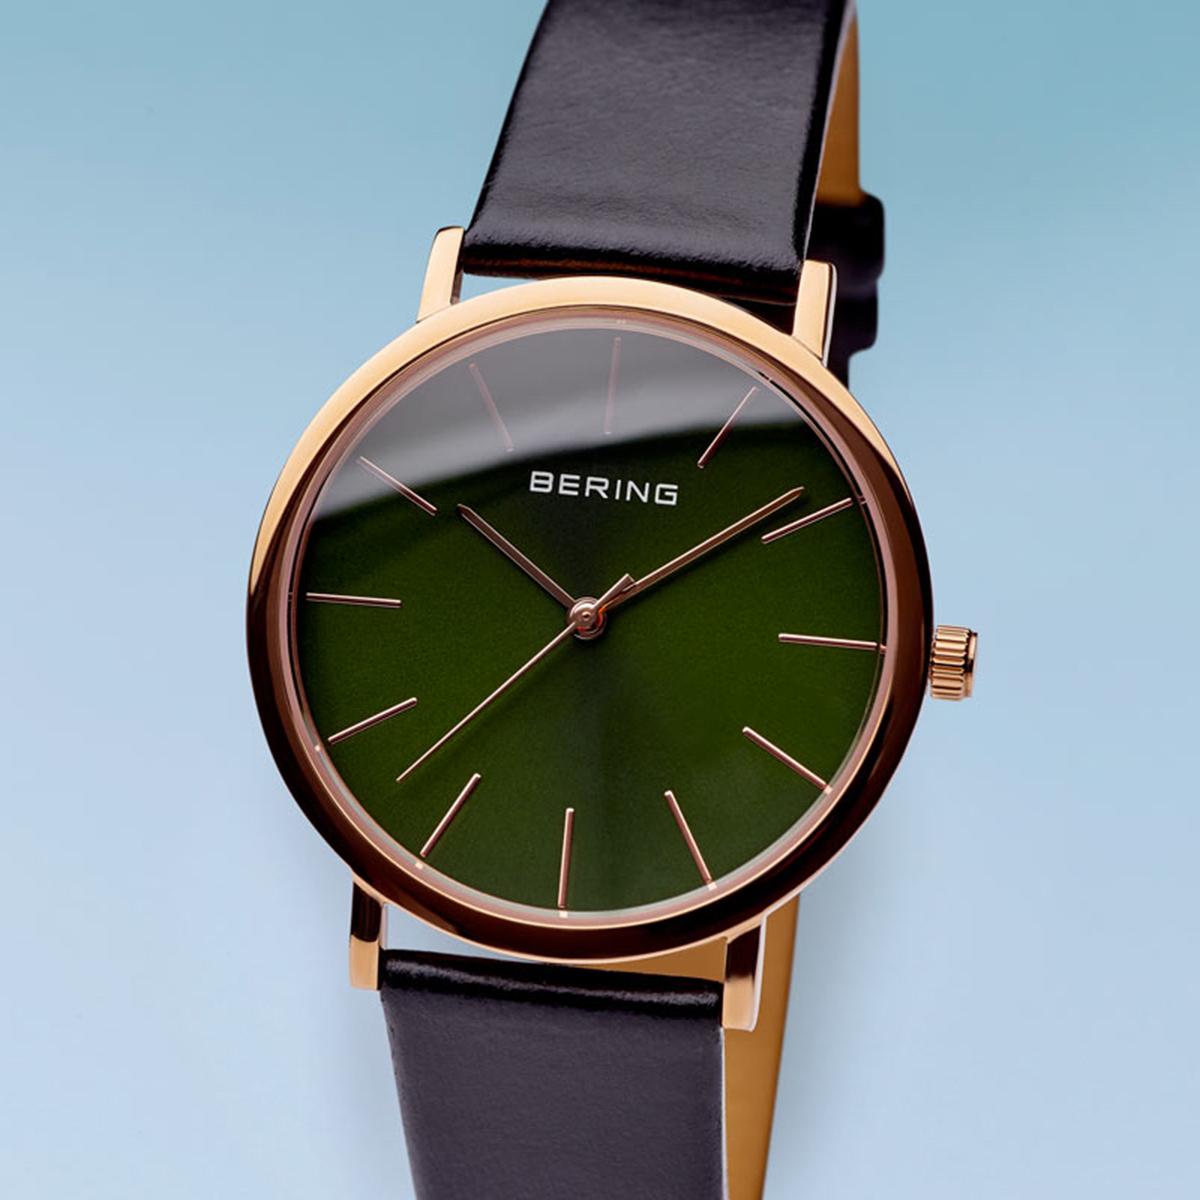 Zegarek damski Bering classic 13436-469 - duże 2